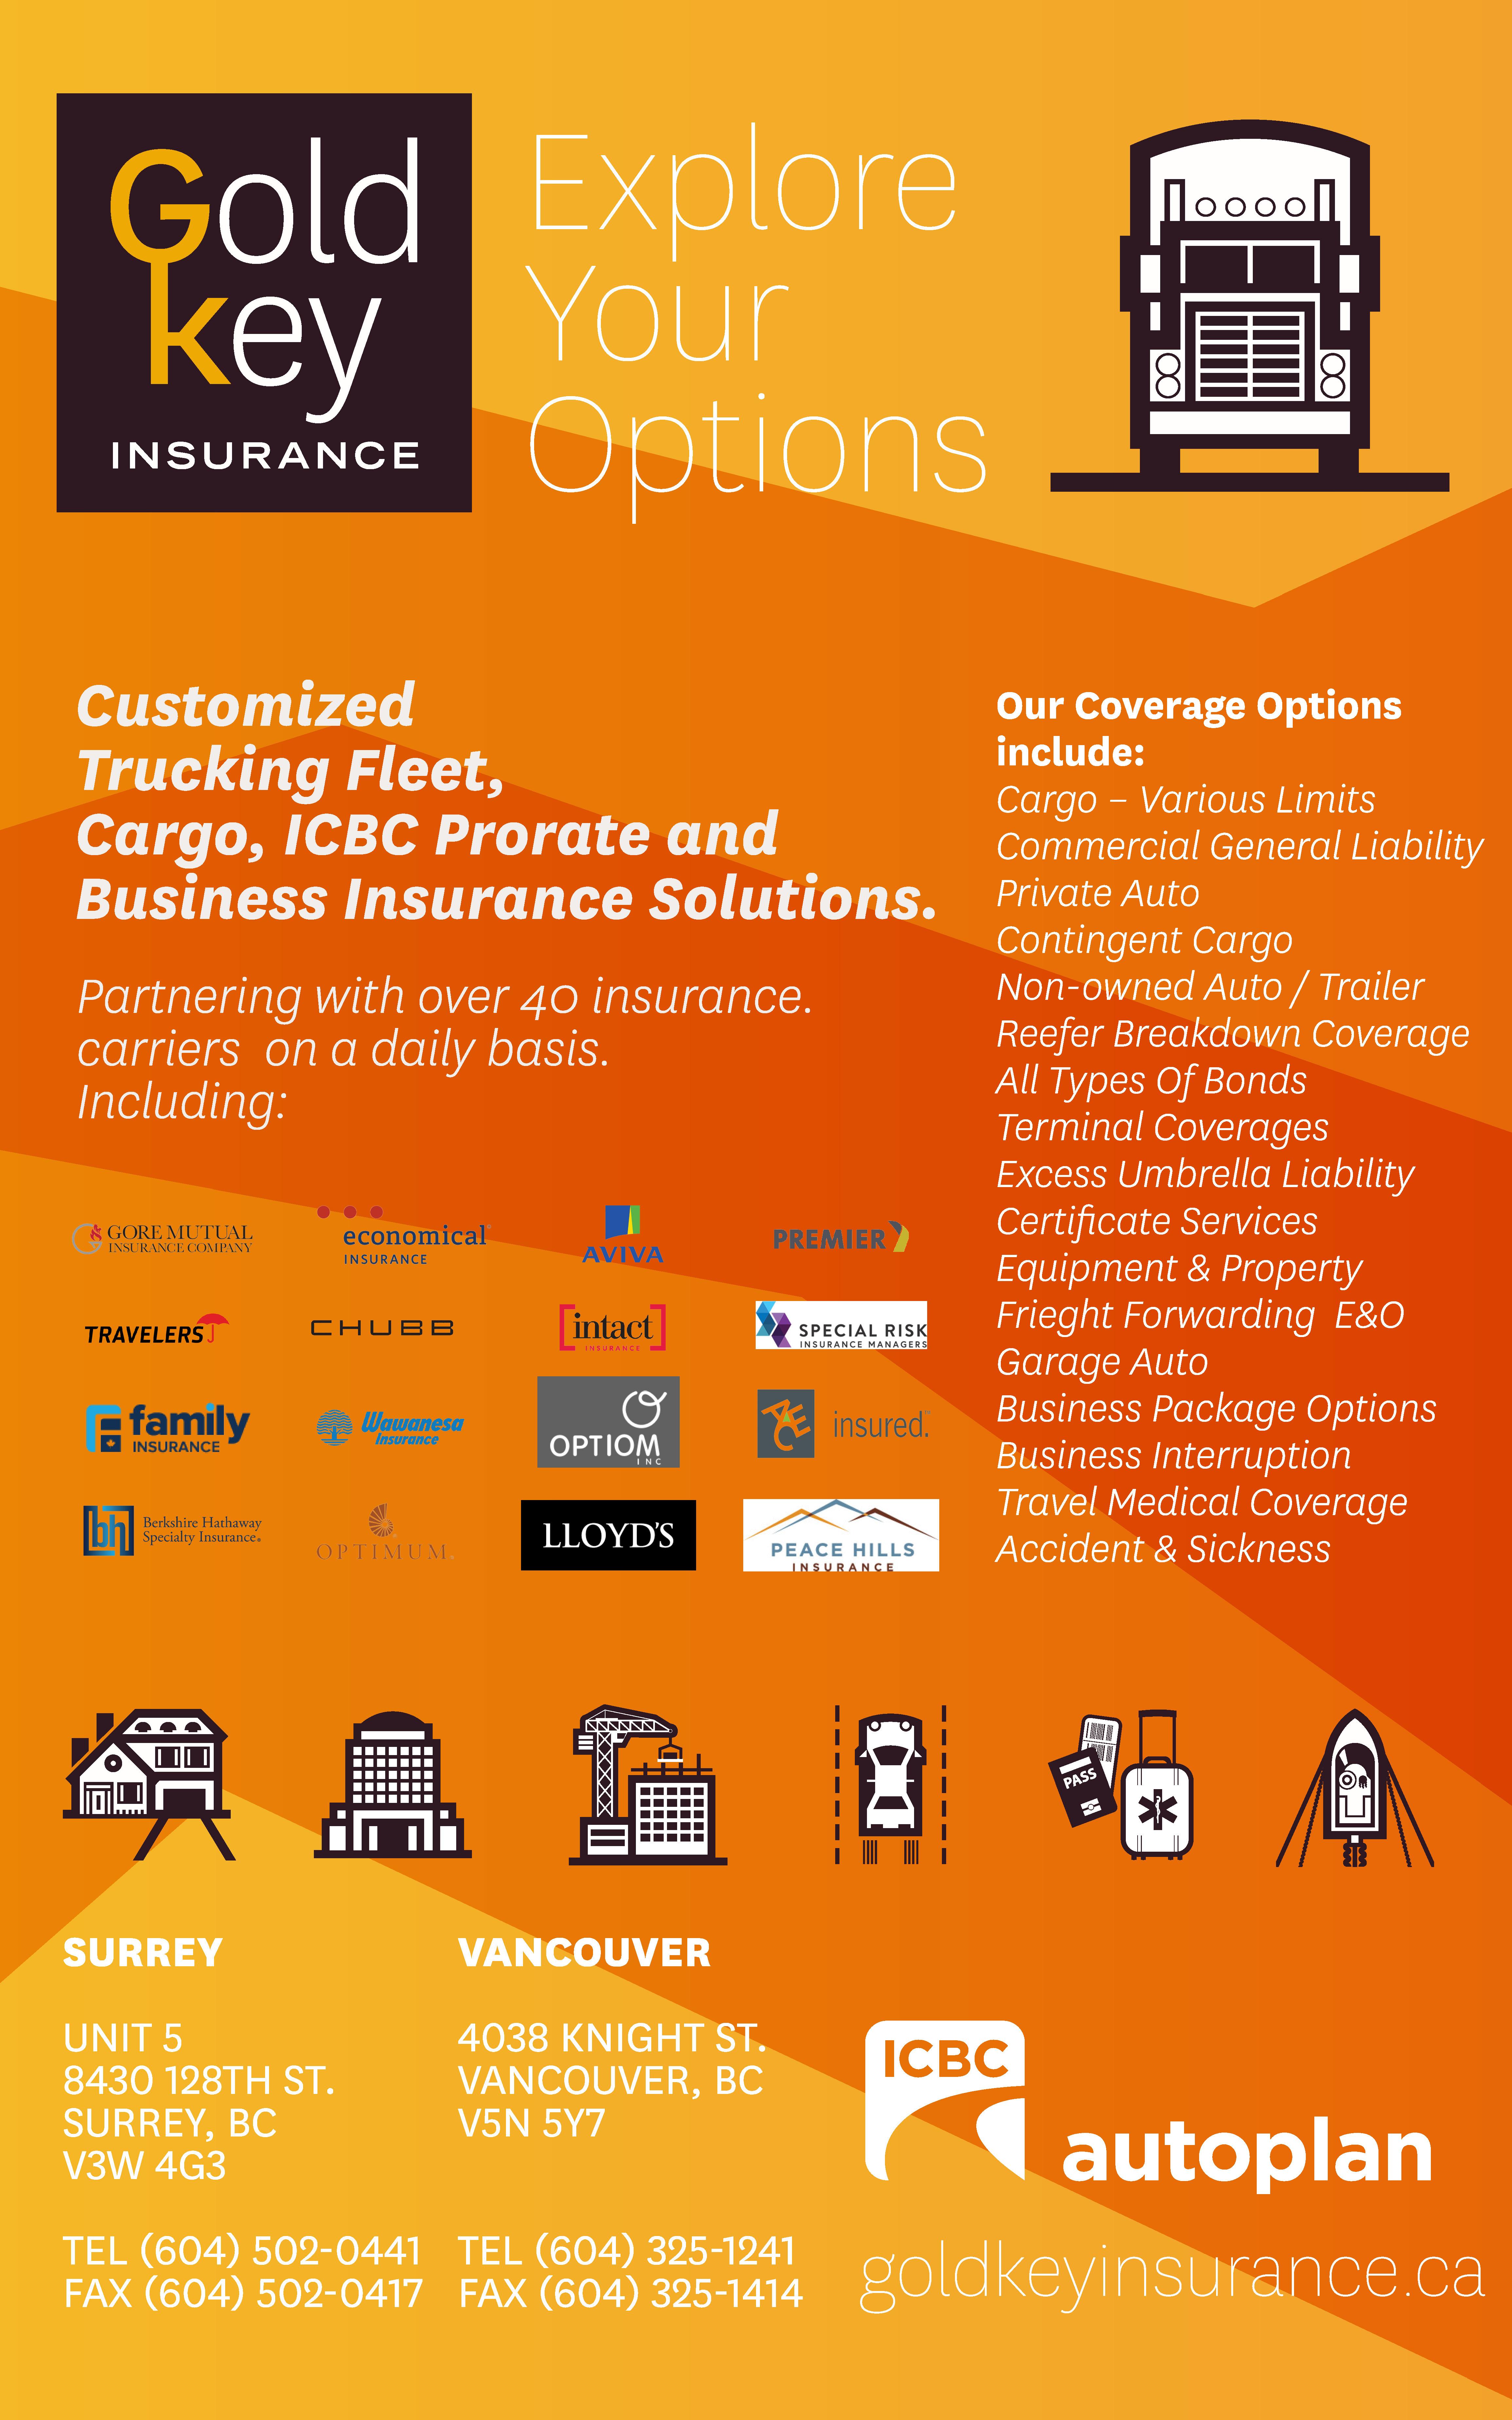 gold-key-insurance-services-ltd-yV1Hsrg.jpeg